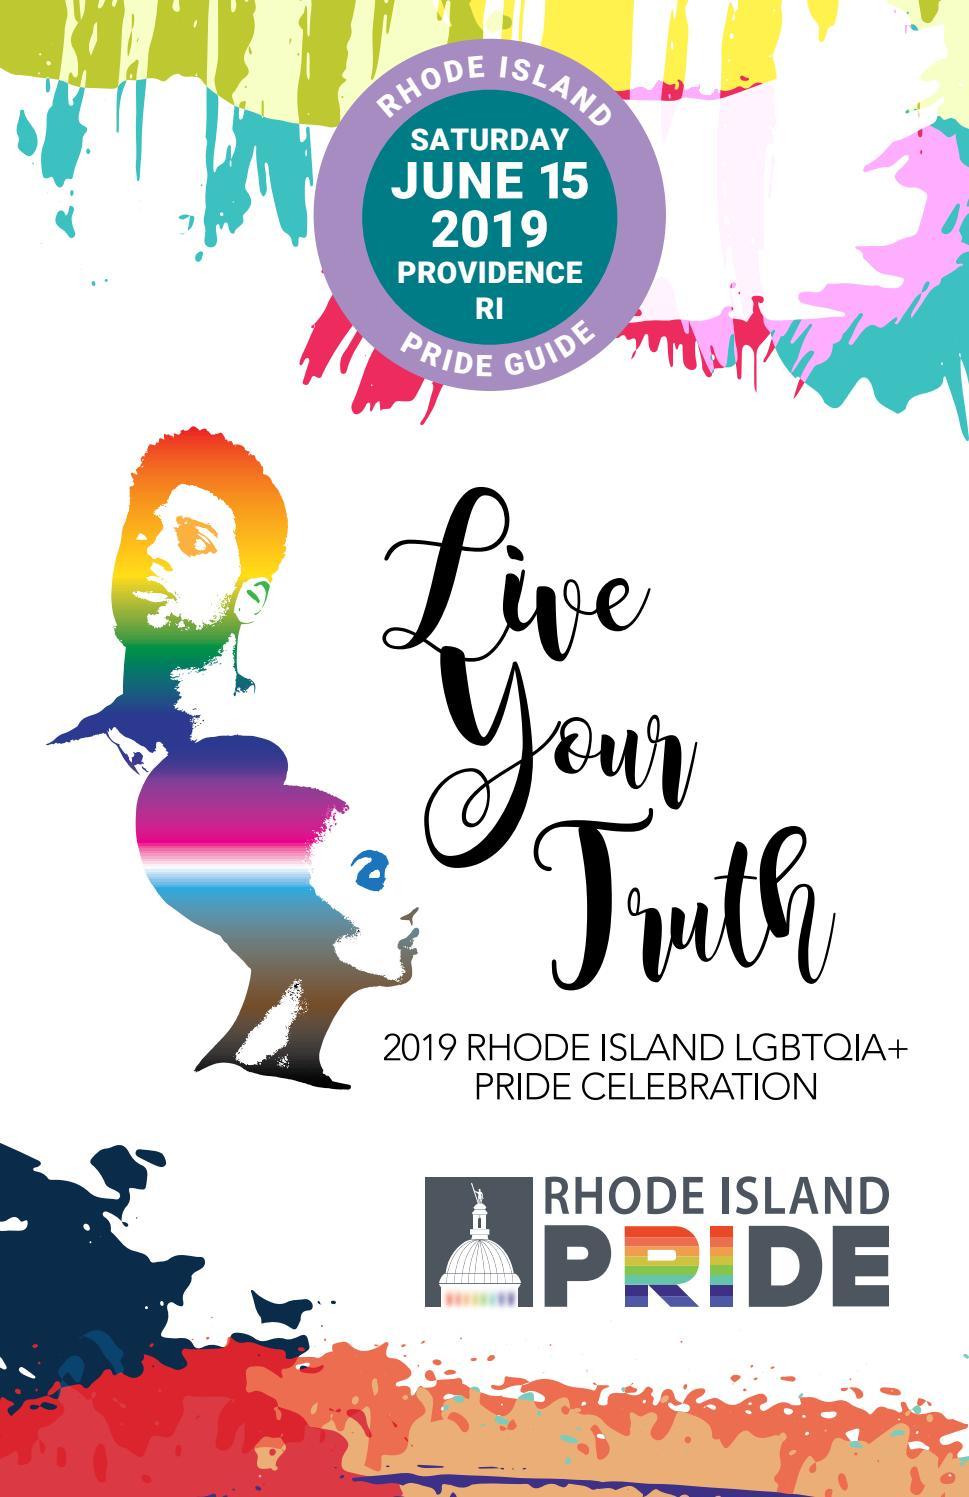 2019 Rhode Island Pride Guide by Will Tregaskis - issuu